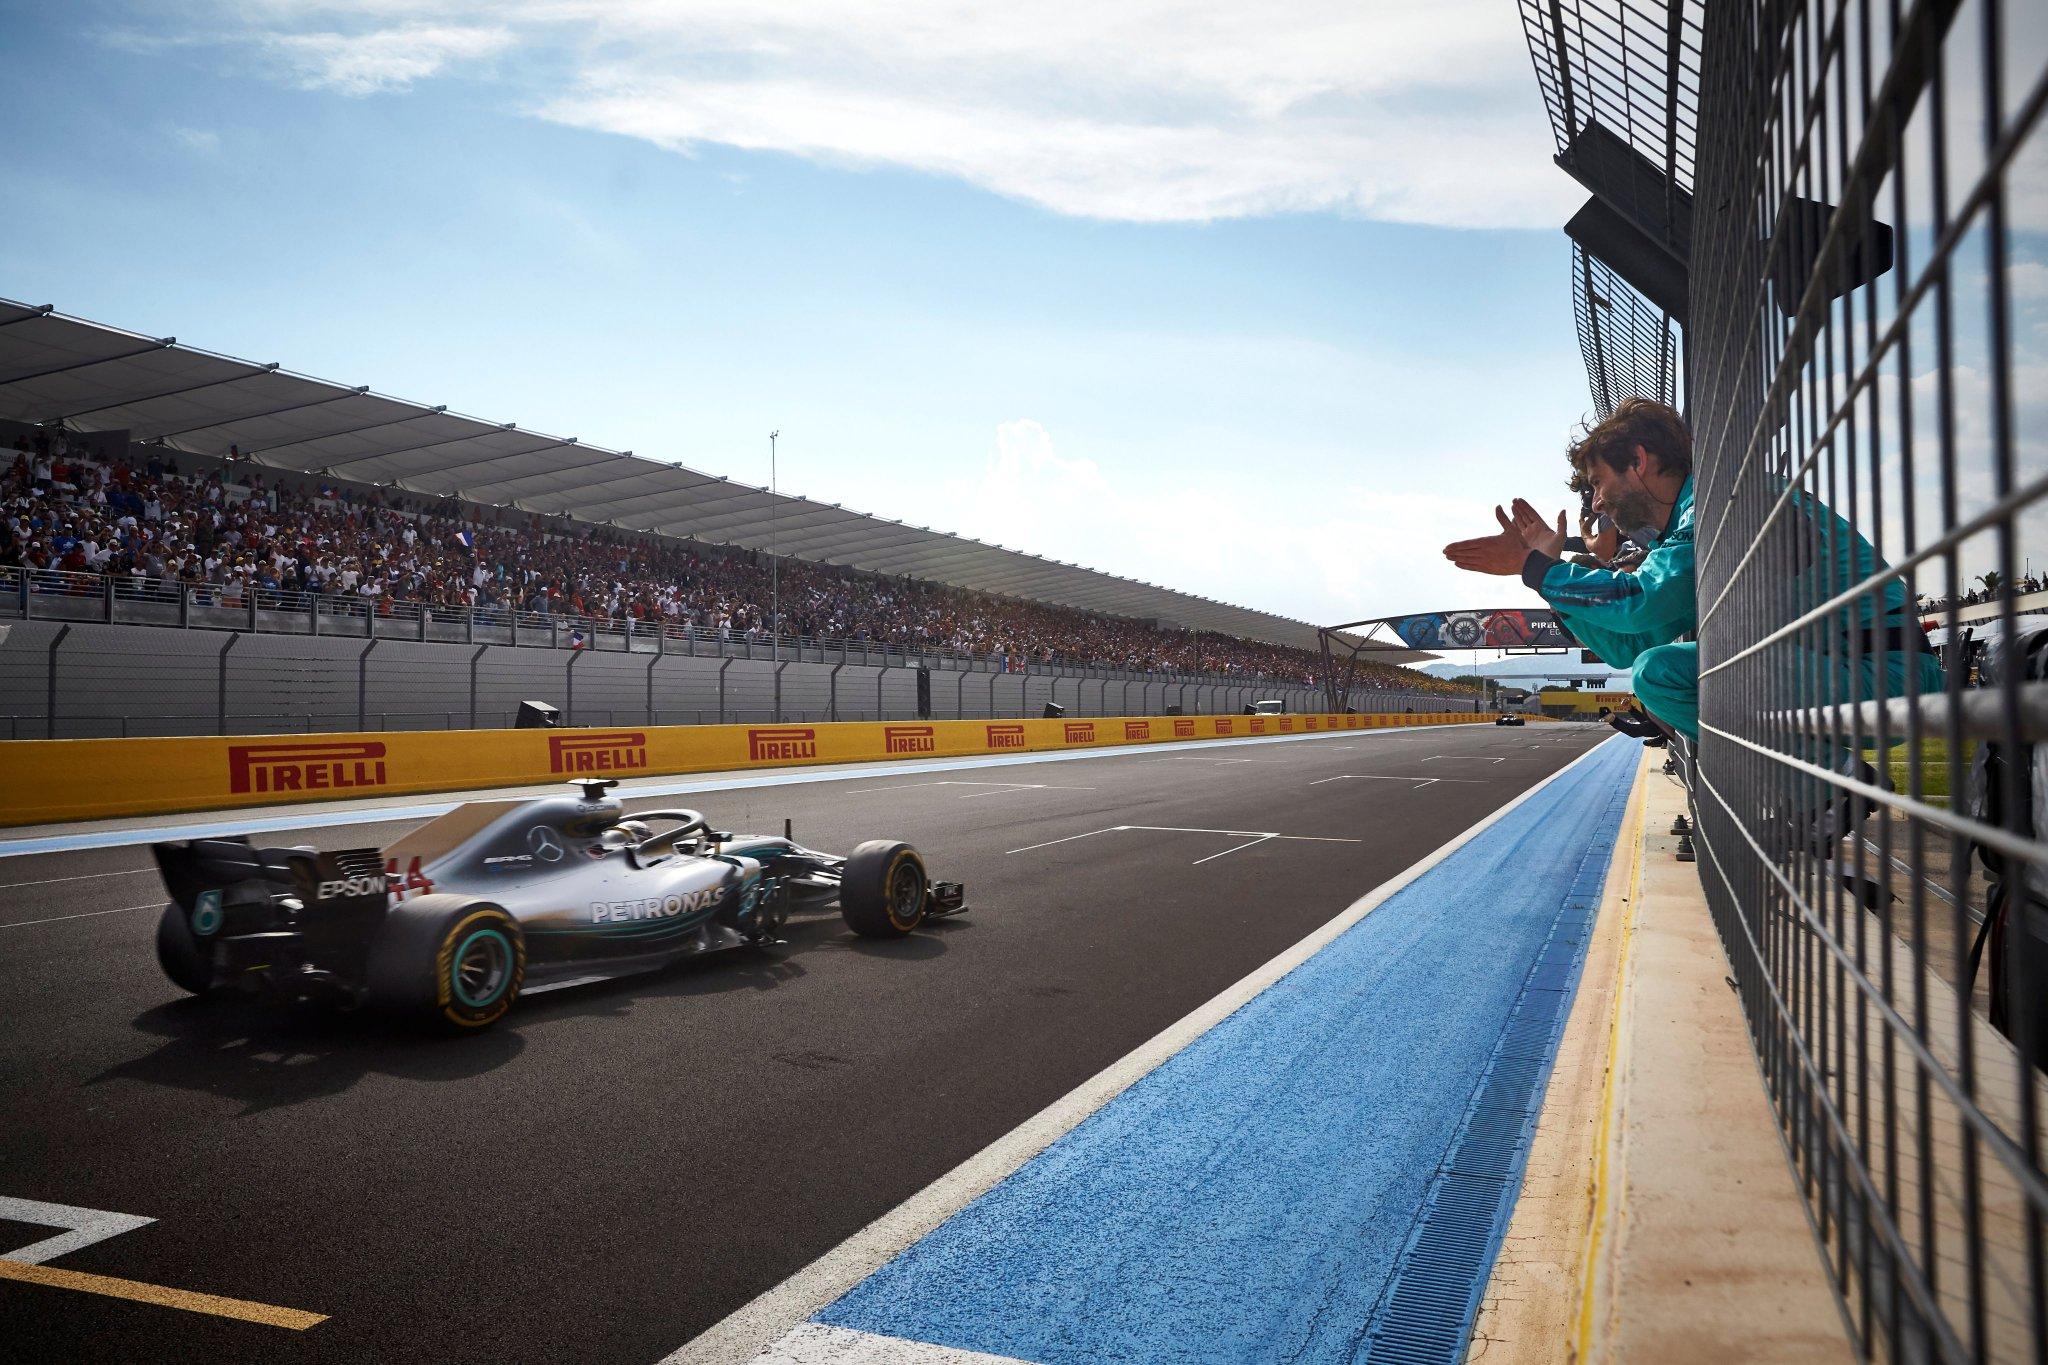 Lewis crosses the line at Paul Ricard in P1